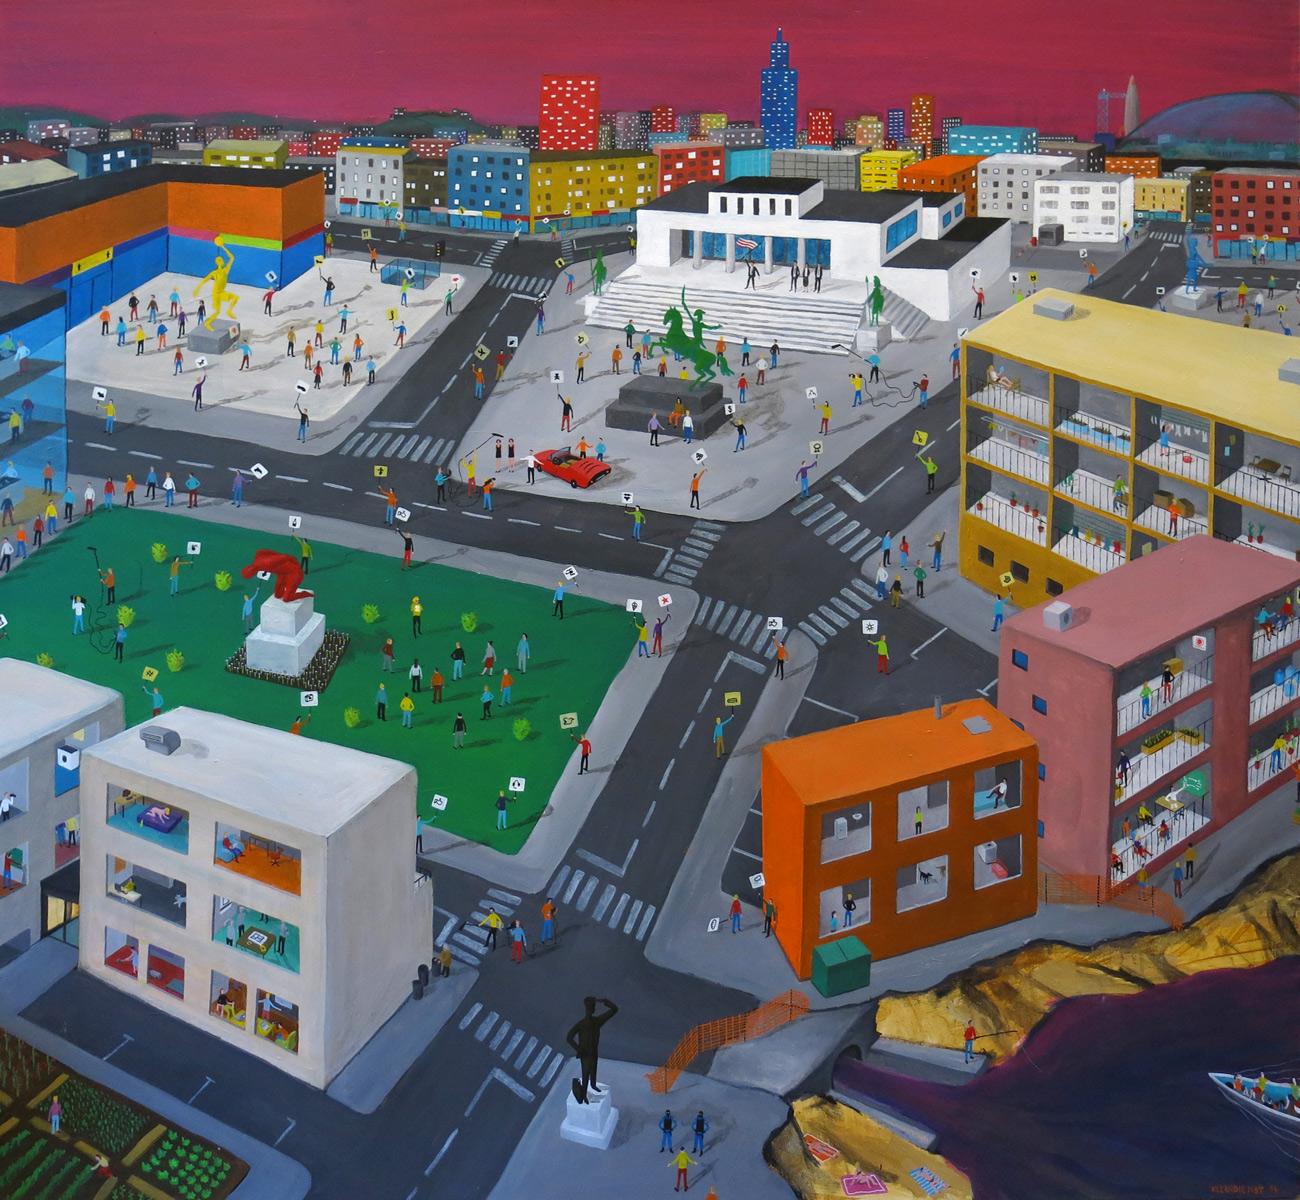 electric sky_third-decade_2015_stas-kleindienst-atelier home gallery